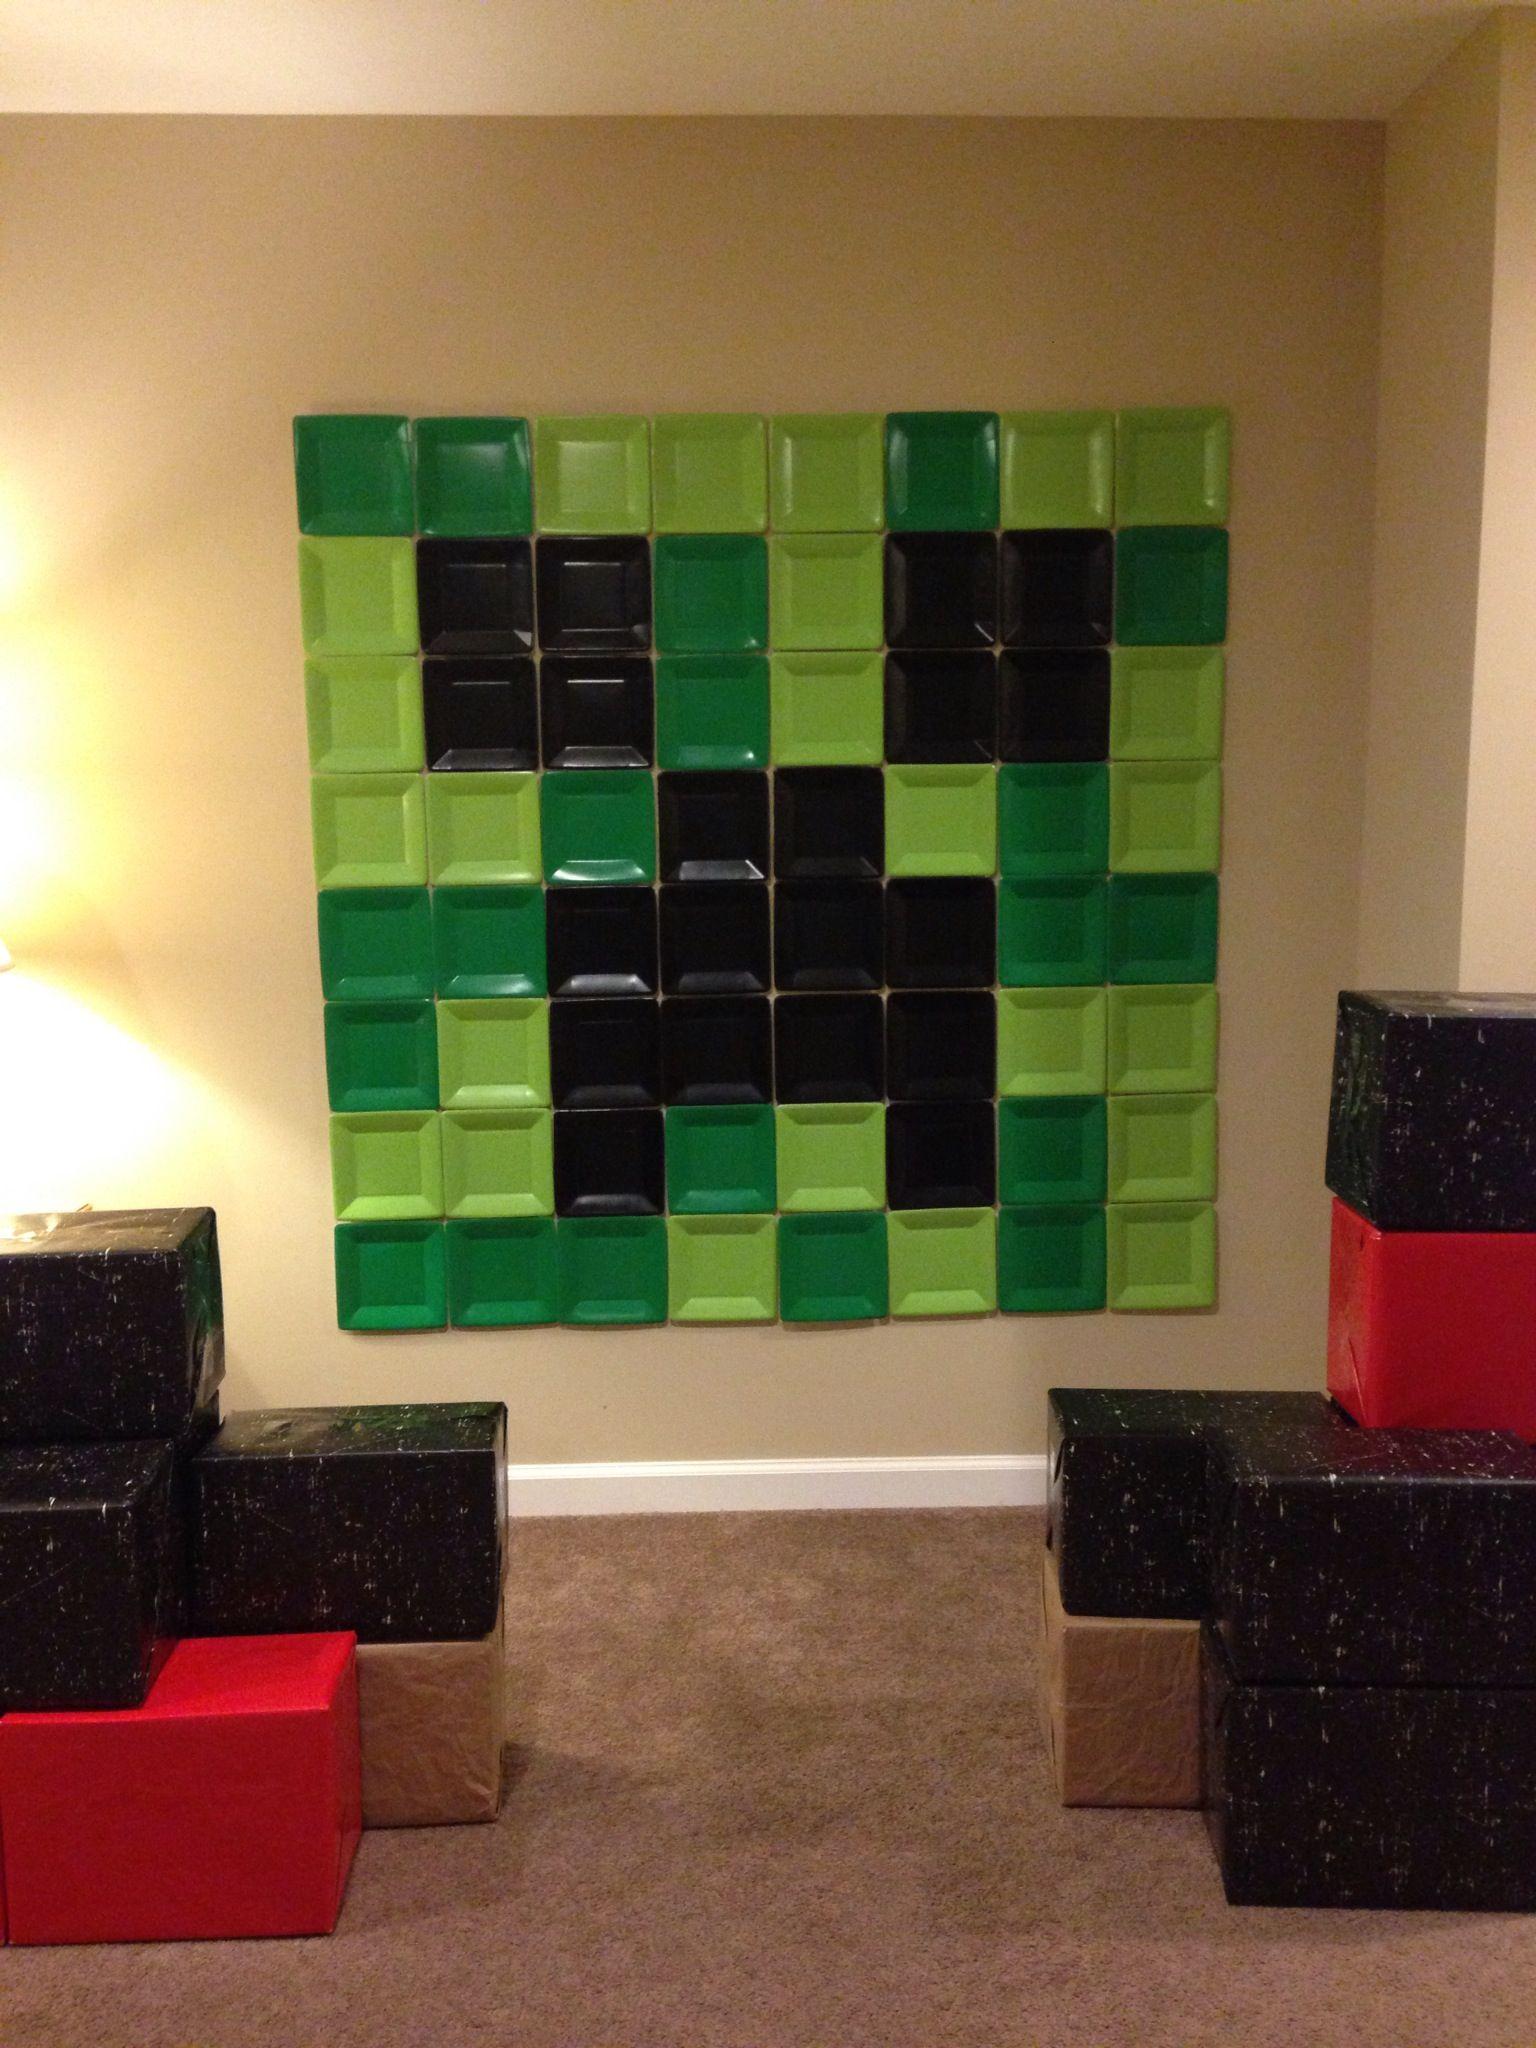 Minecraft Simple Wall Designs : minecraft, simple, designs, Creeper, Small, Paper, Plate, Decor, Minecraft, Wall,, Designs,, Stickers, Wallpaper